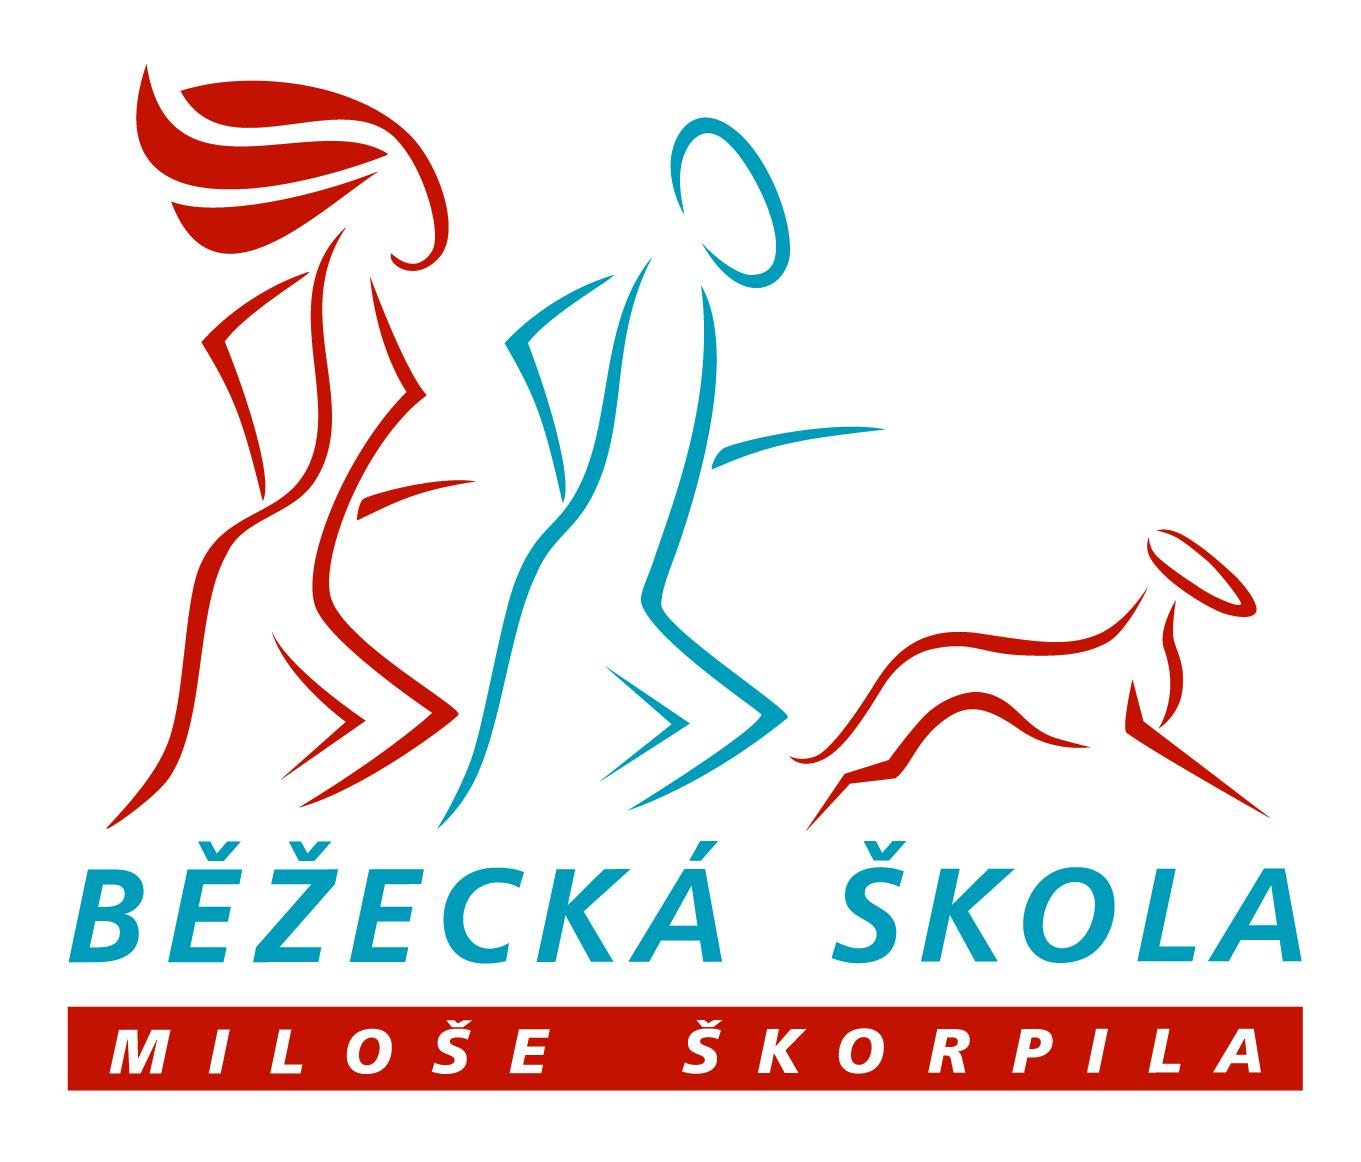 Běžecká škola Miloše Škorpila